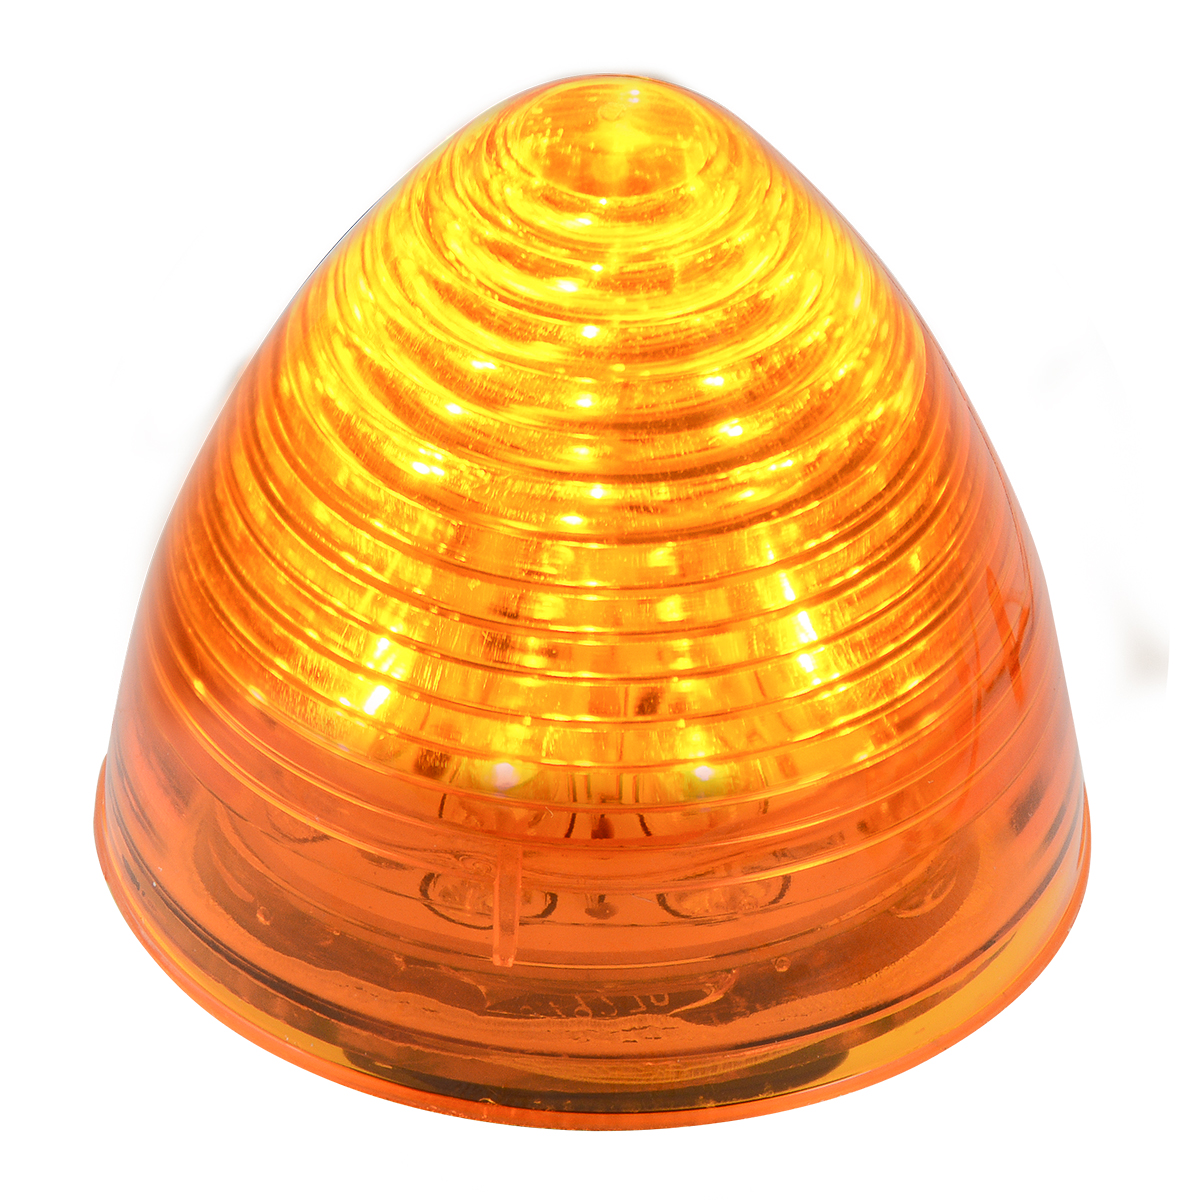 "#79270 2"" Beehive LED Flat Amber/Amber Light"